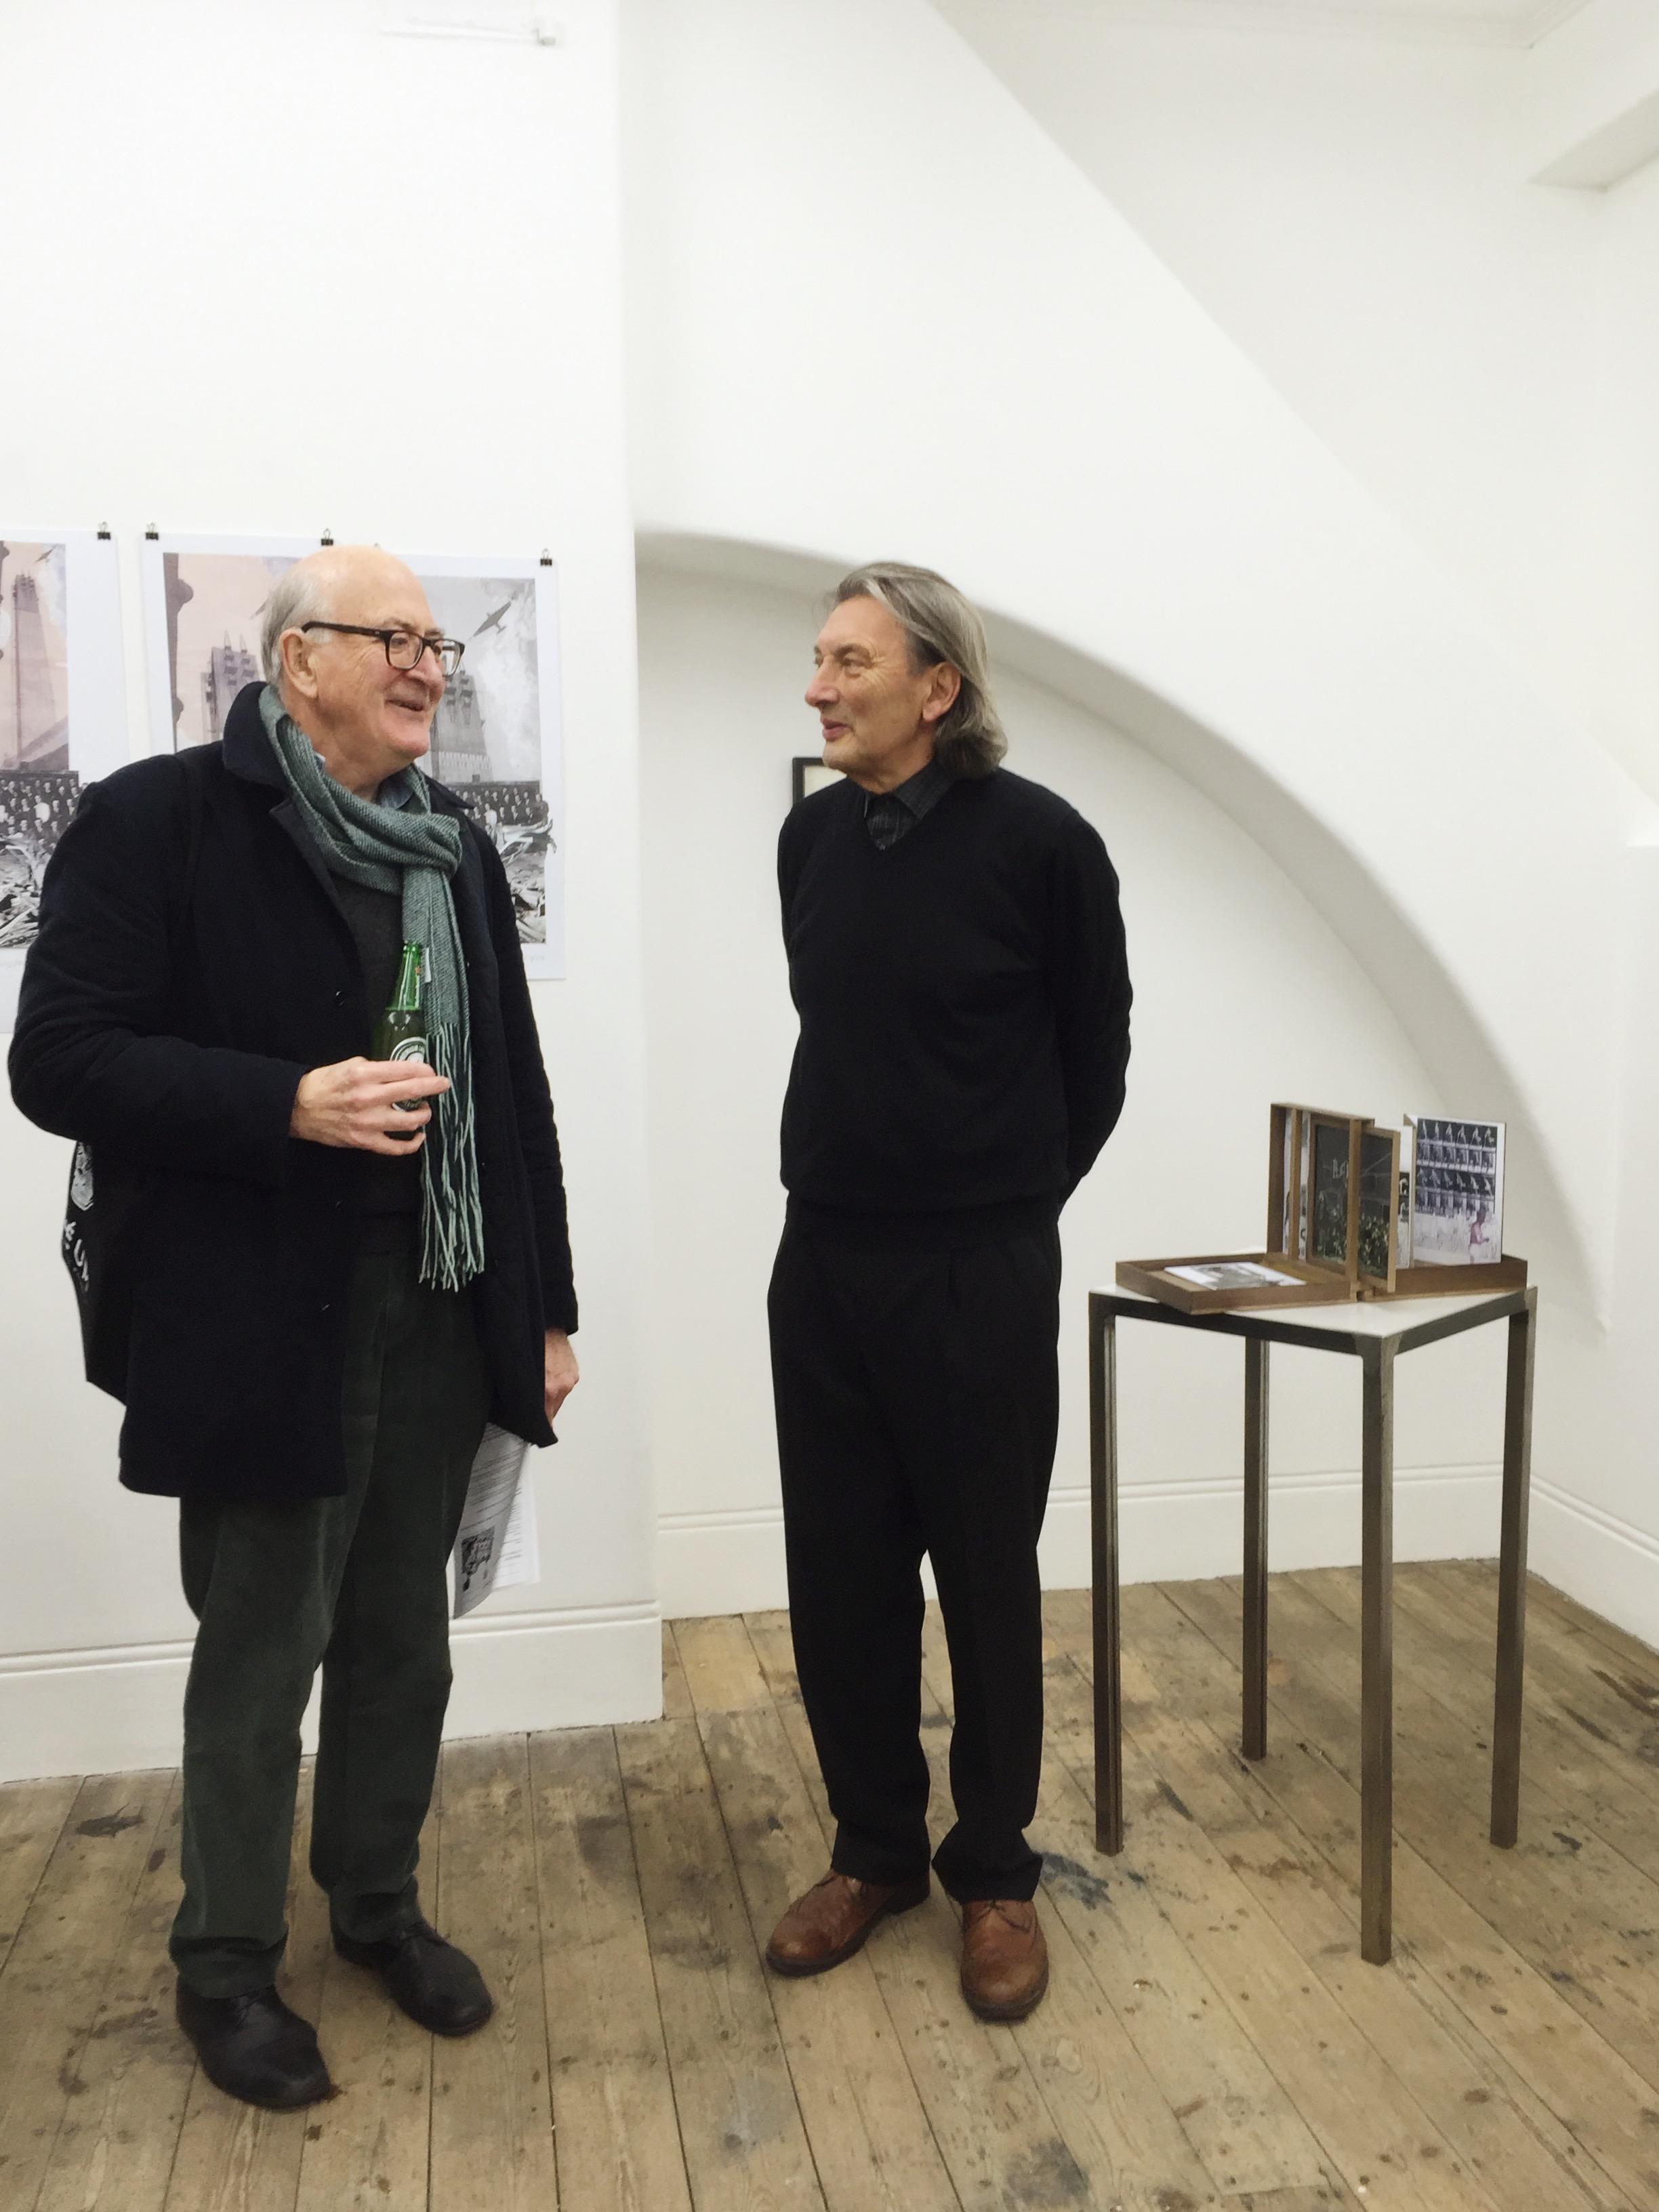 Journalist Colin Martin and Fred Scott